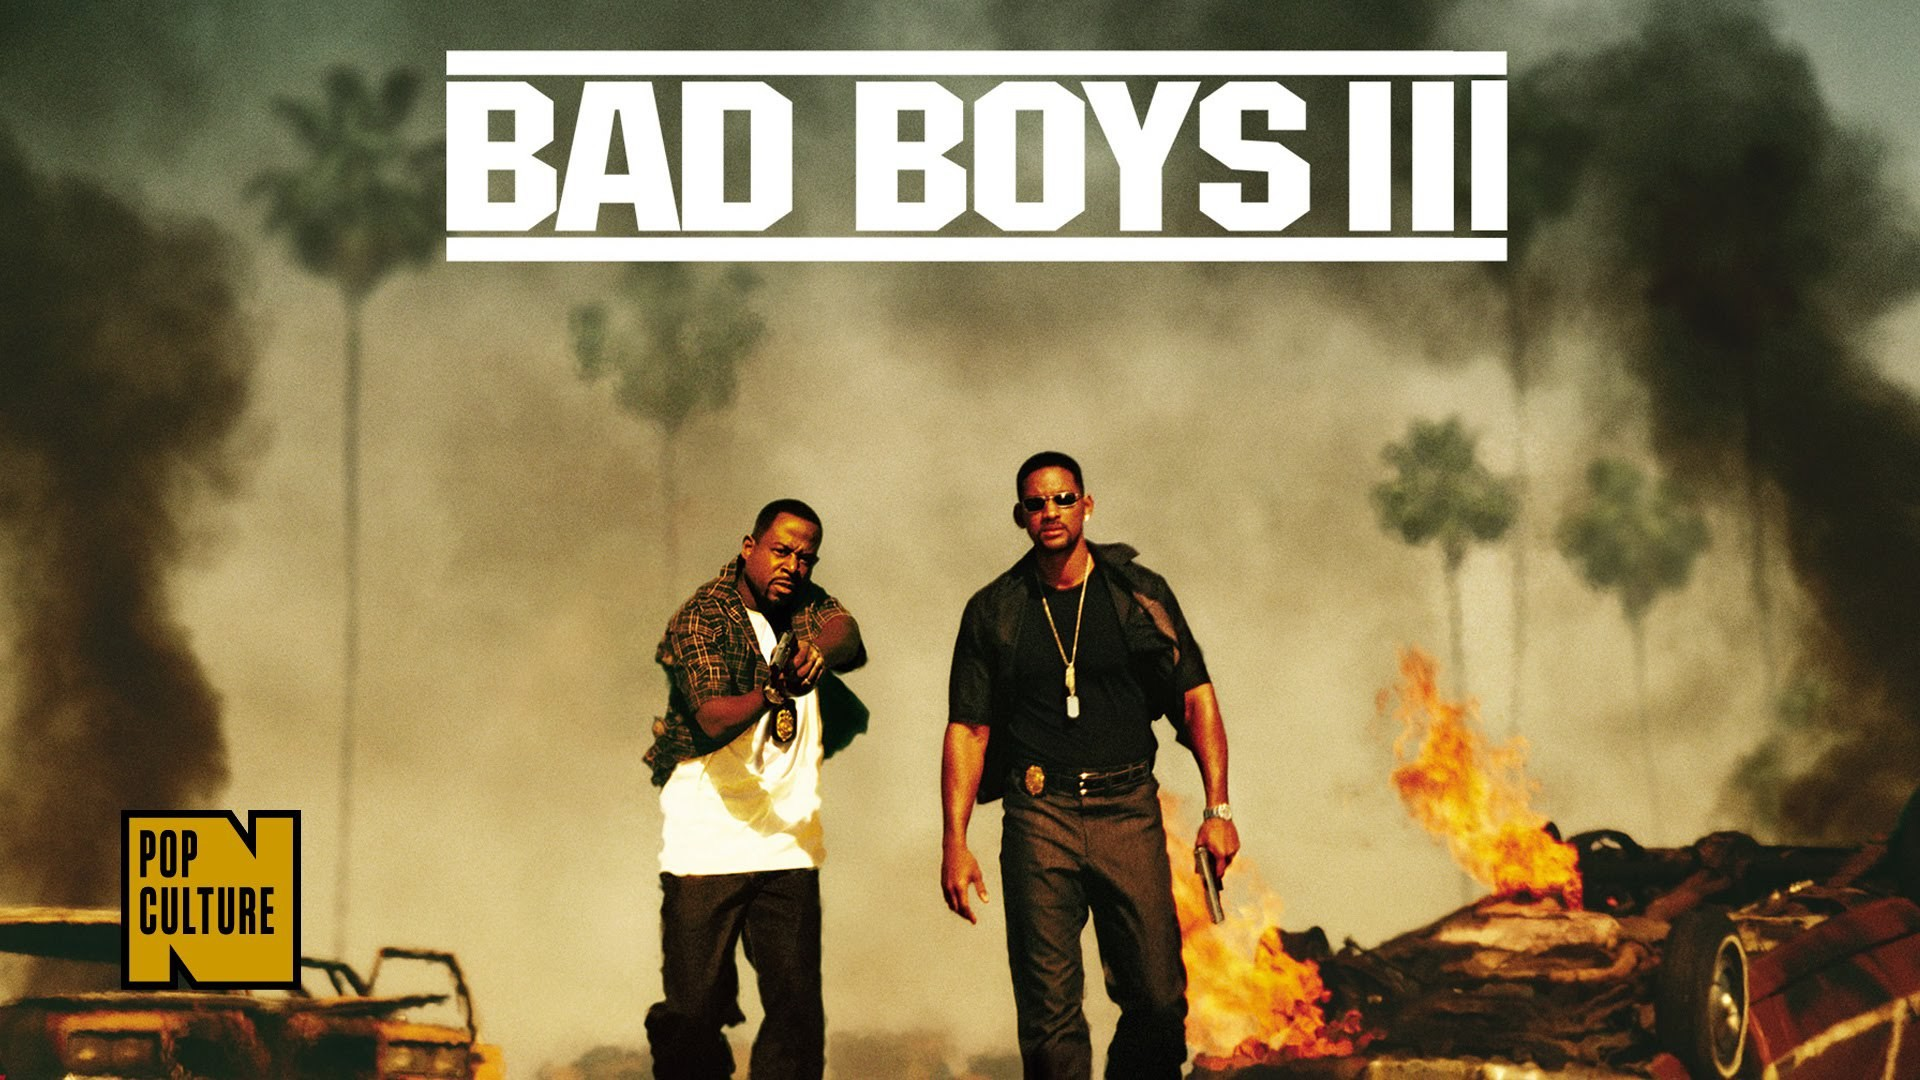 Bad Boys Wallpapers, Pc, Mac, Laptop, Tablet, Mobile - Bad Boys 3 2019 - HD Wallpaper